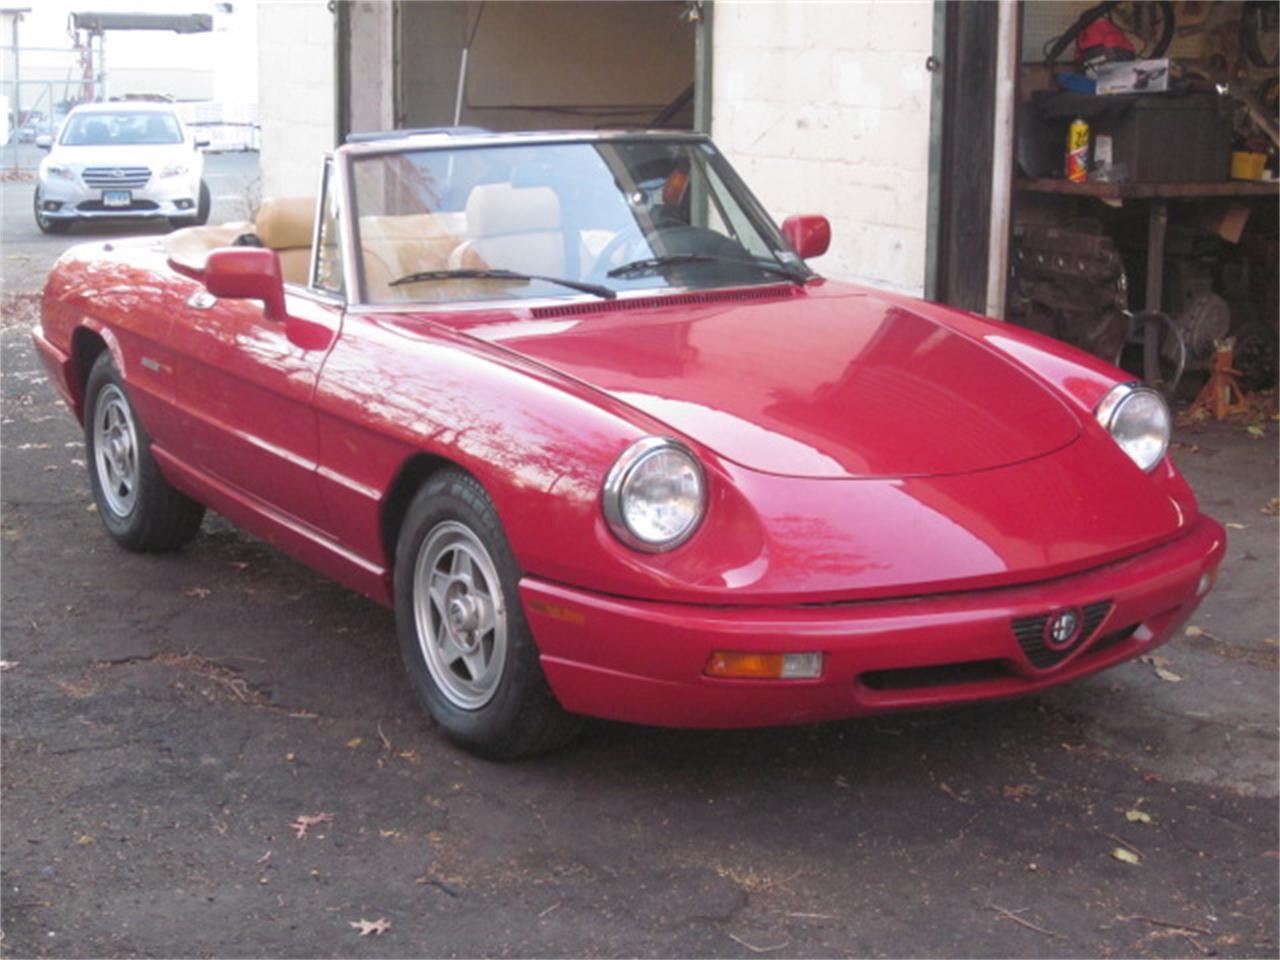 Alfa Romeo Spider For Sale ClassicCarscom CC - 1991 alfa romeo spider for sale